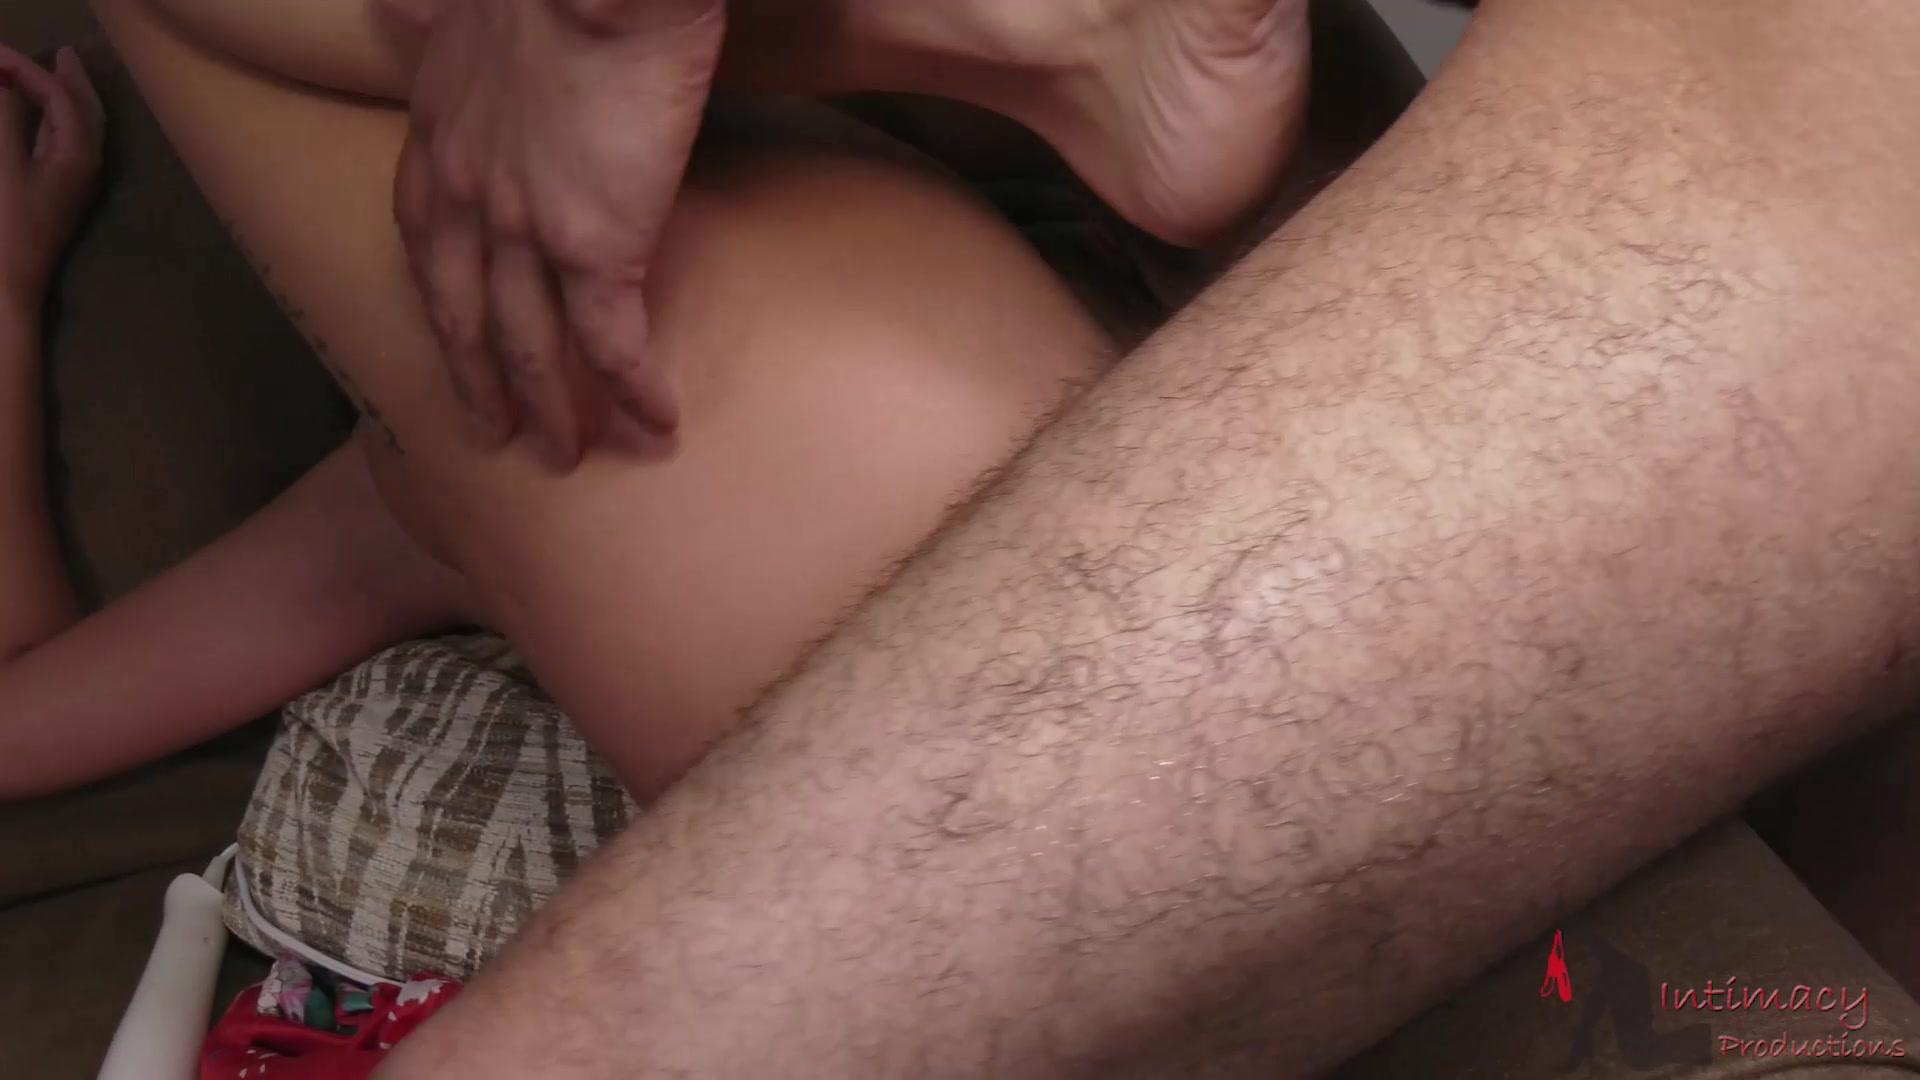 Bellas 1St Bg Anal Videos On Demand  Adult Dvd Empire-7059